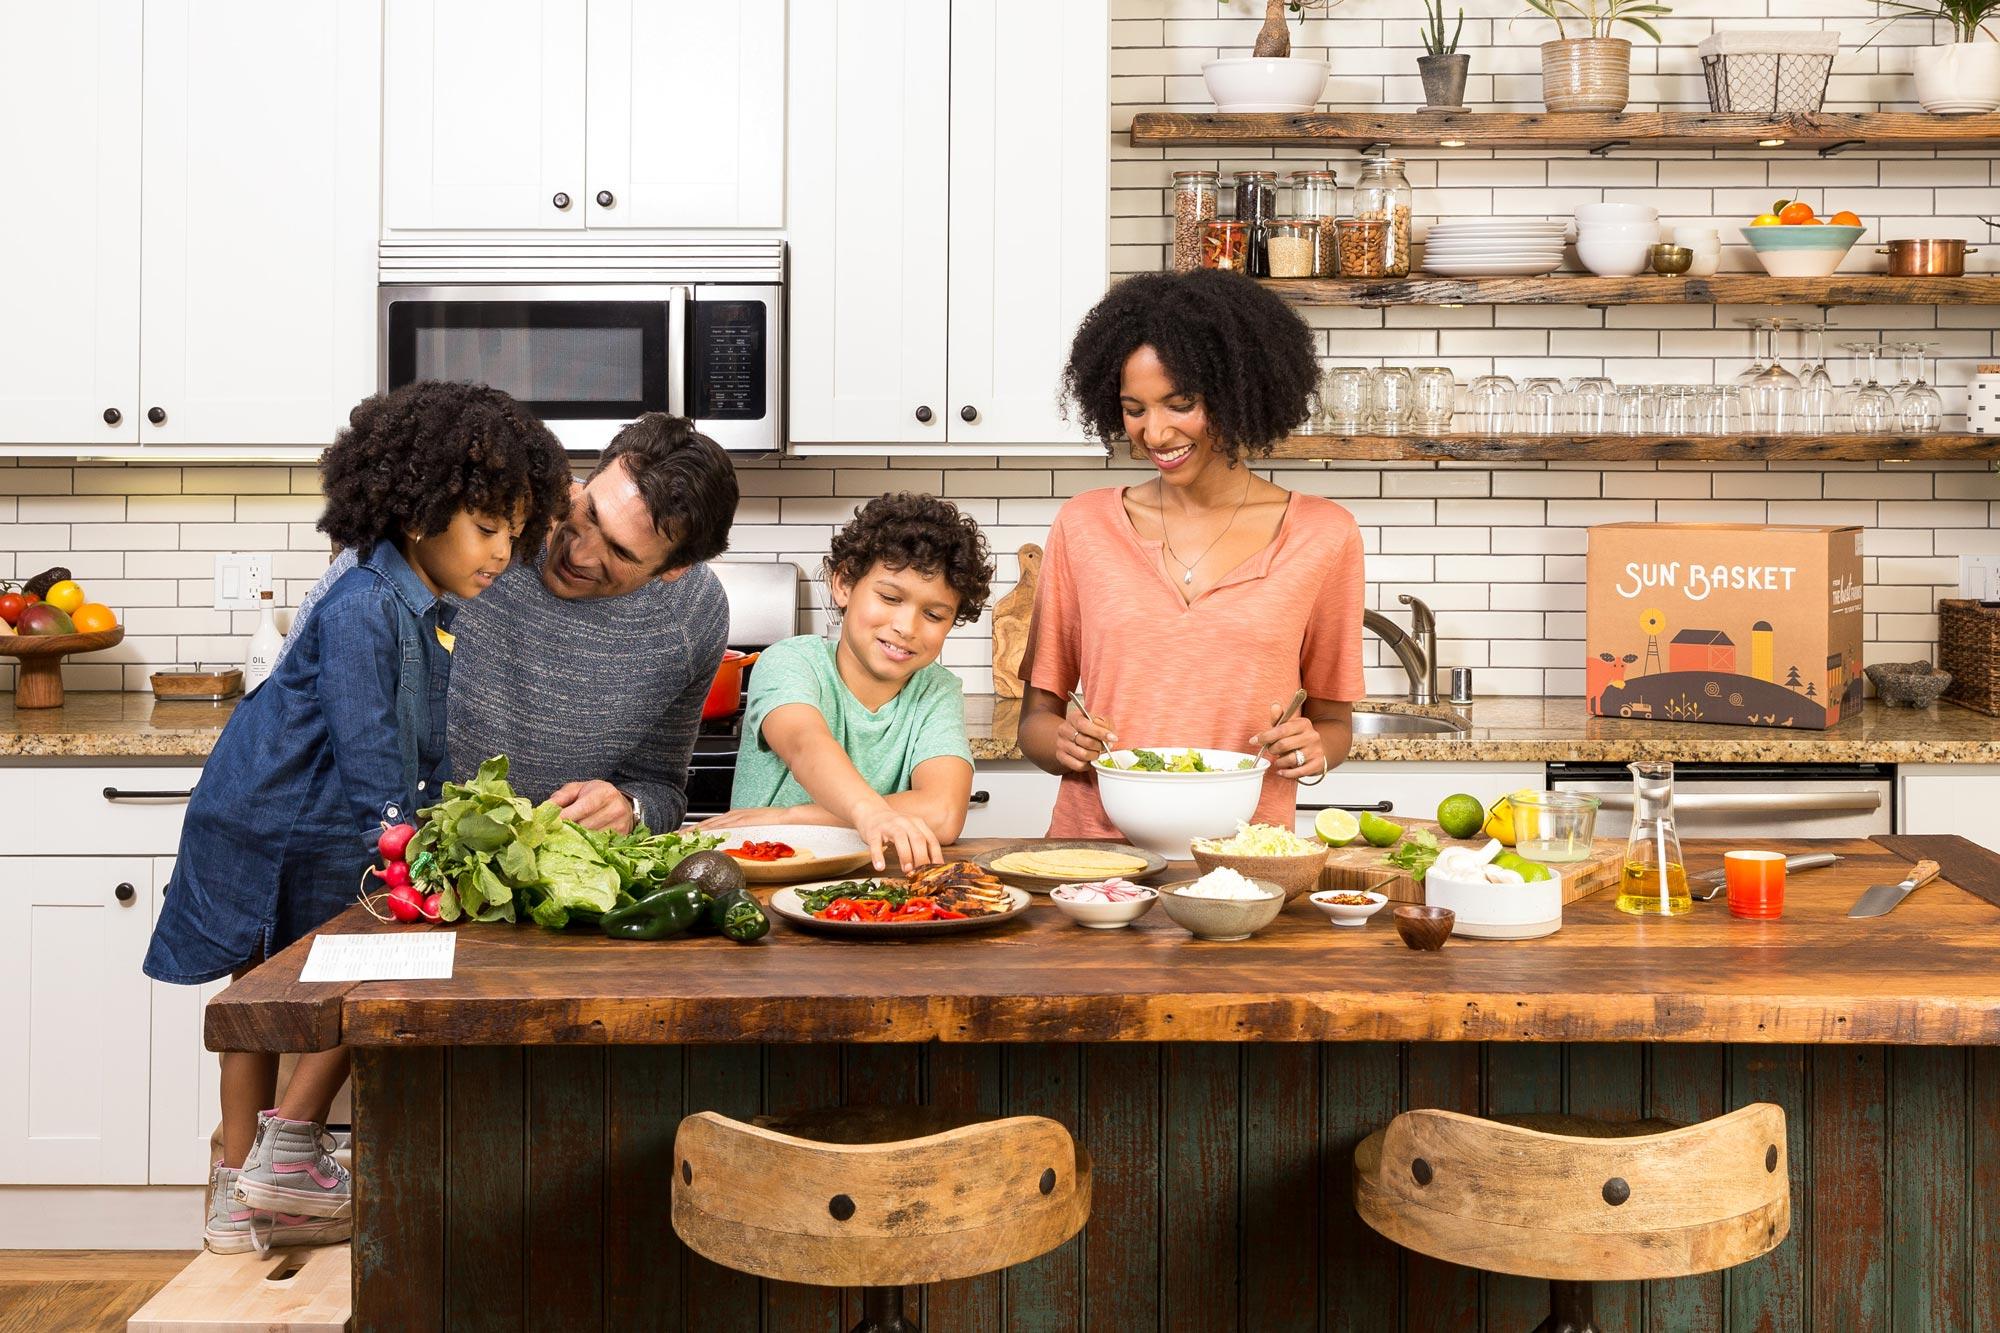 Family-Plan-Lifestyle-Images_5583_2x3H_Hero.jpg